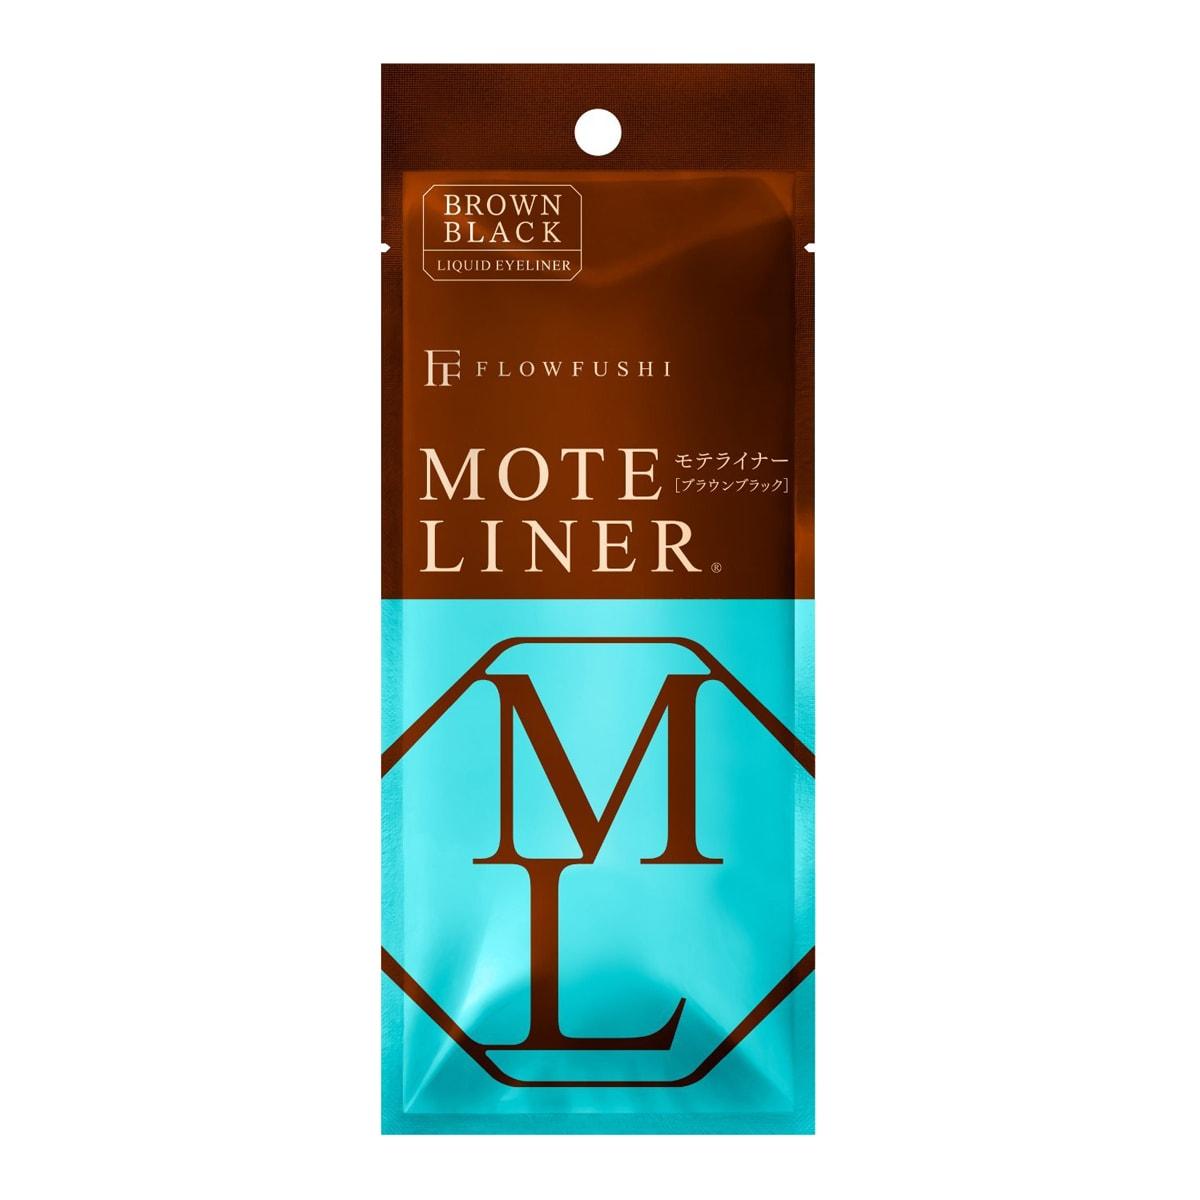 FLOWFUSHI MOTE LINER Liquid Eyeliner #BrownBlack 0.55ml